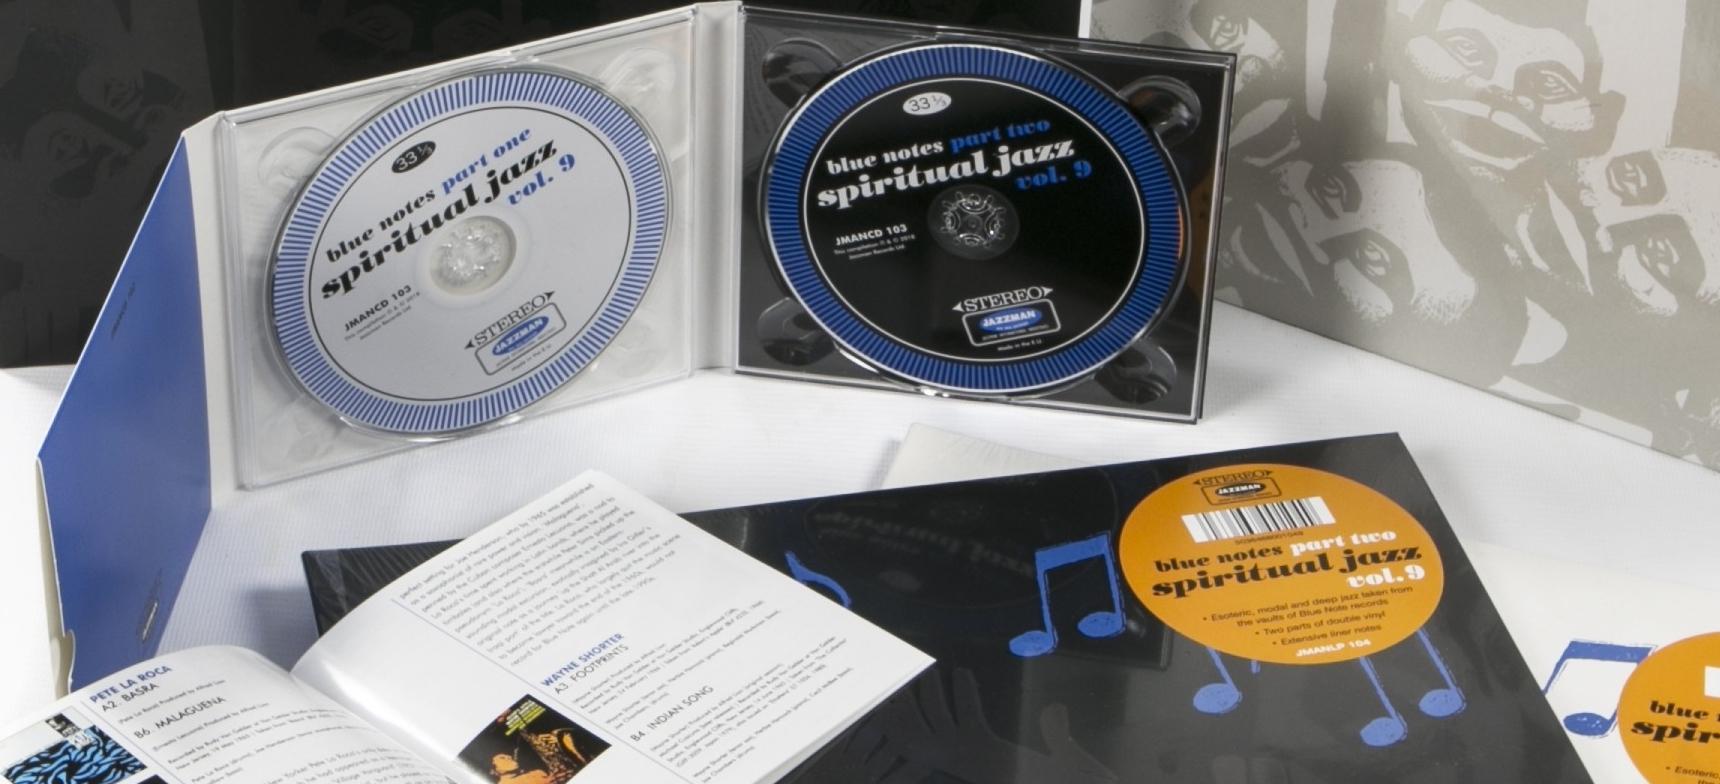 Spiritual Jazz 9: Blue Notes Part 1